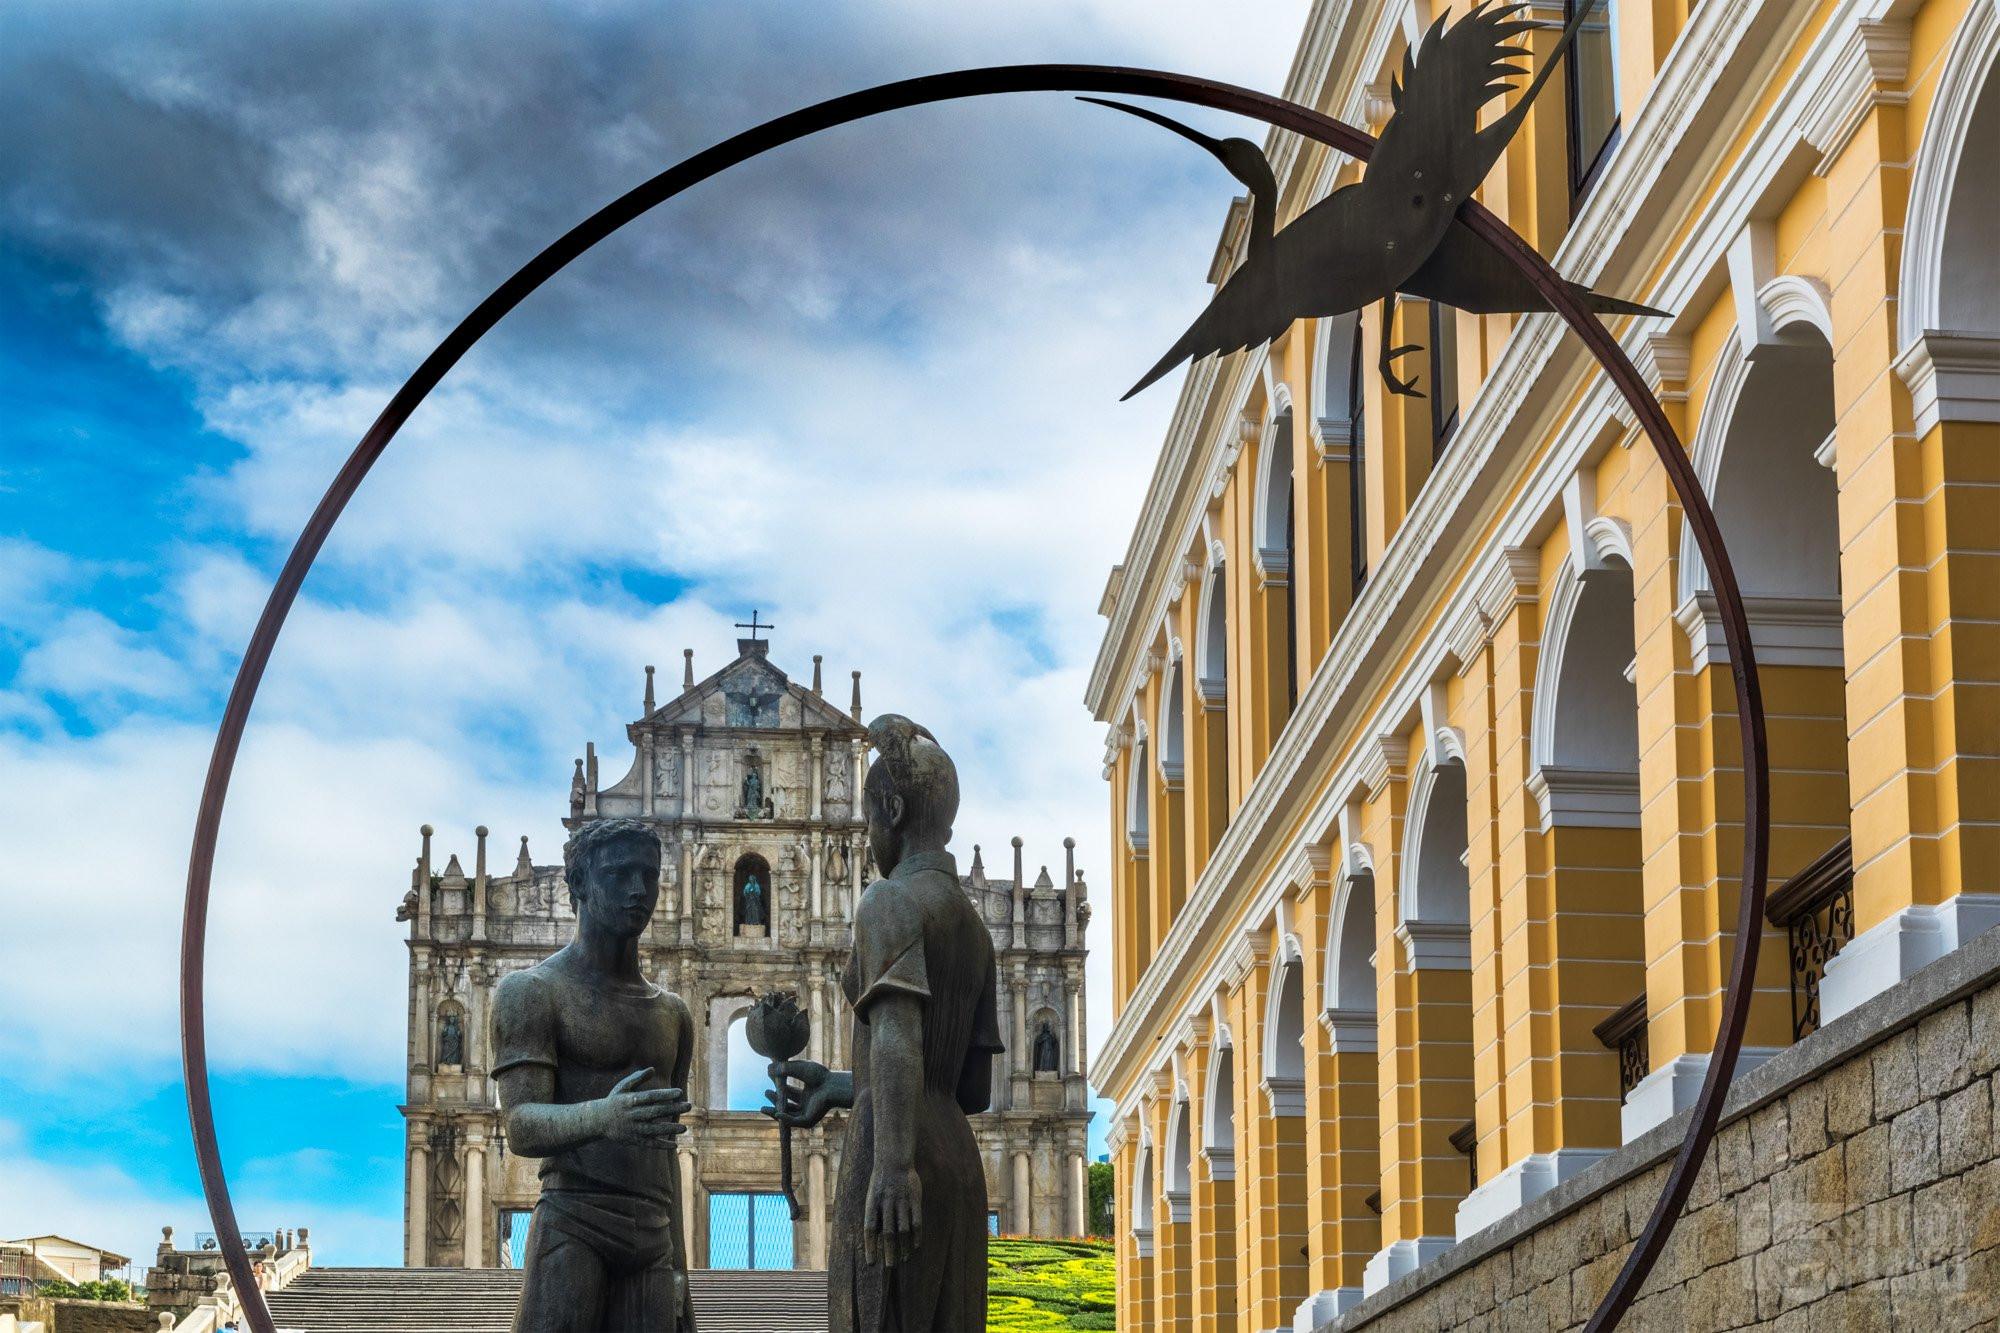 Friendship Statue and Saint Paul ruins, Macao